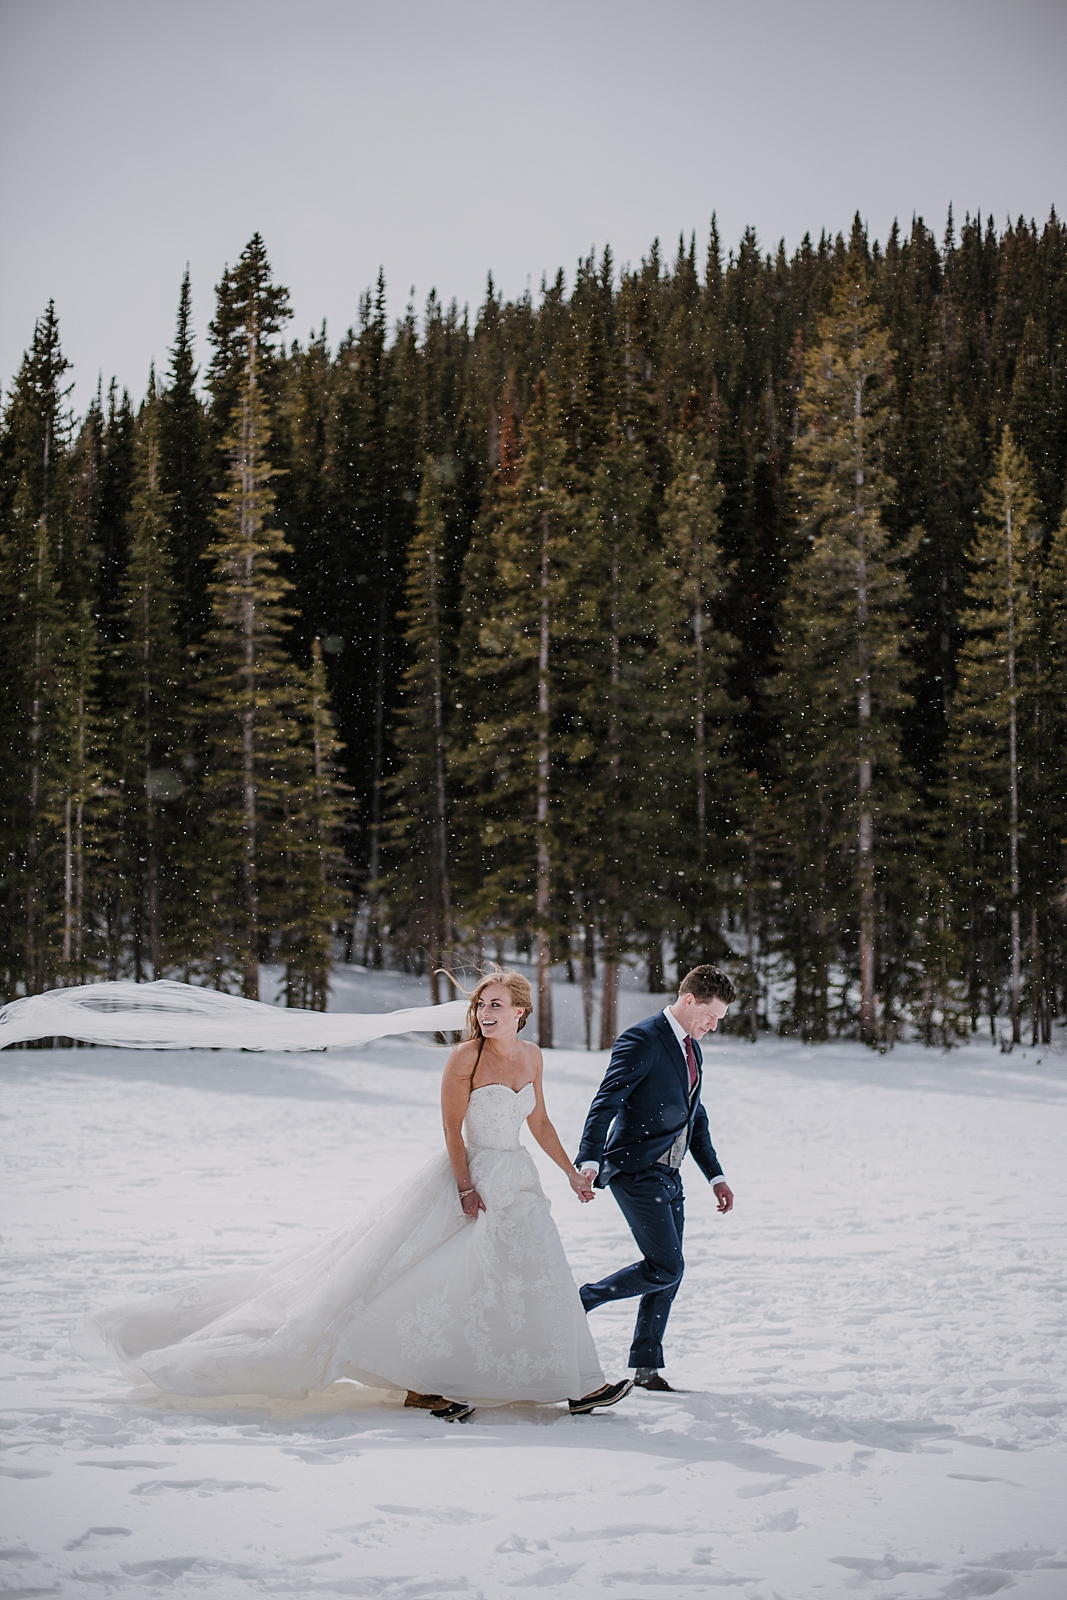 hiking at bear lake in rocky mountain national park, rocky mountain national park elopement, self solemnize in rocky mountain national park, estes park elopement, bear lake elopement